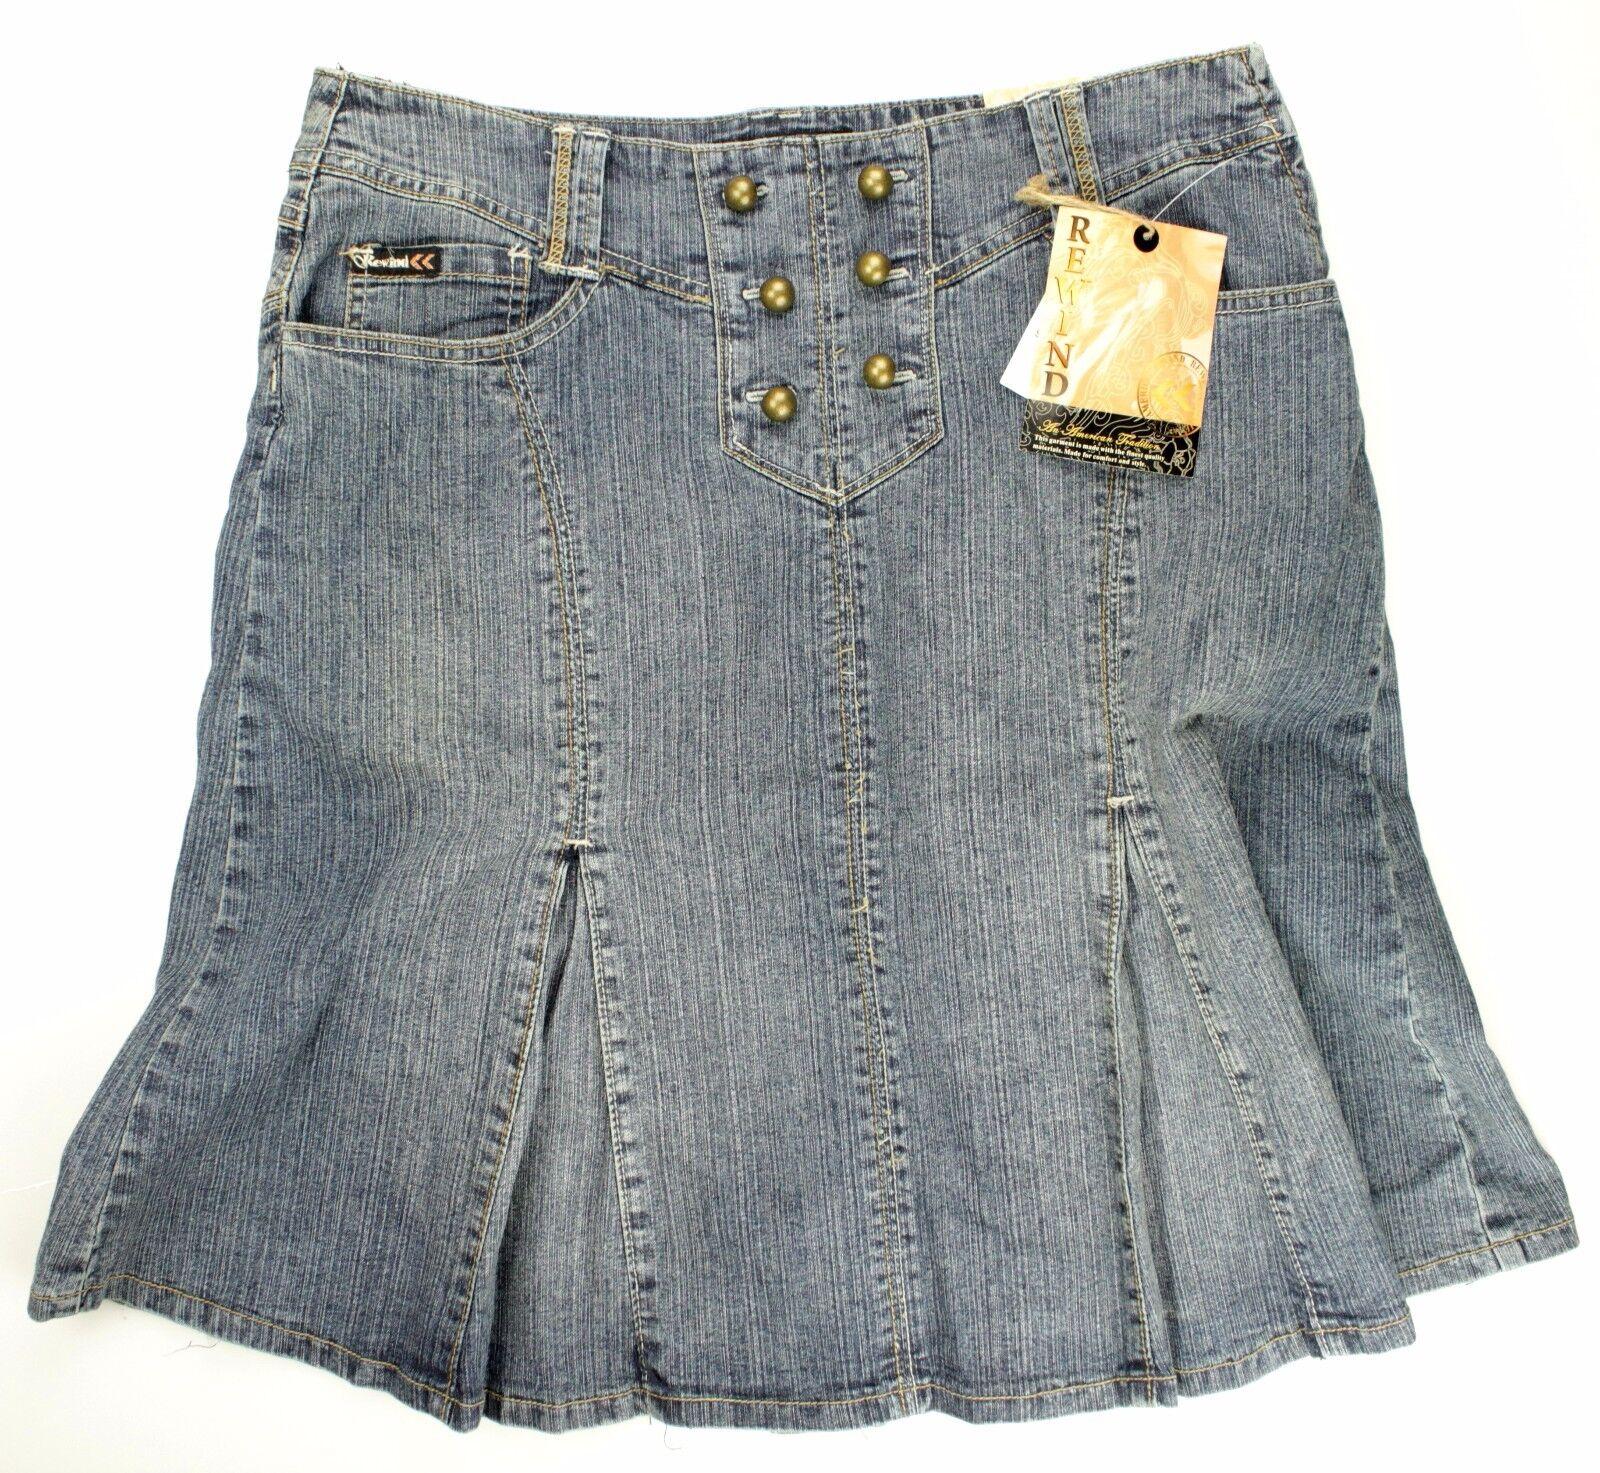 Rewind Women NWT A line Skirt Size 11 bluee Ramie Denim Pleated Casual